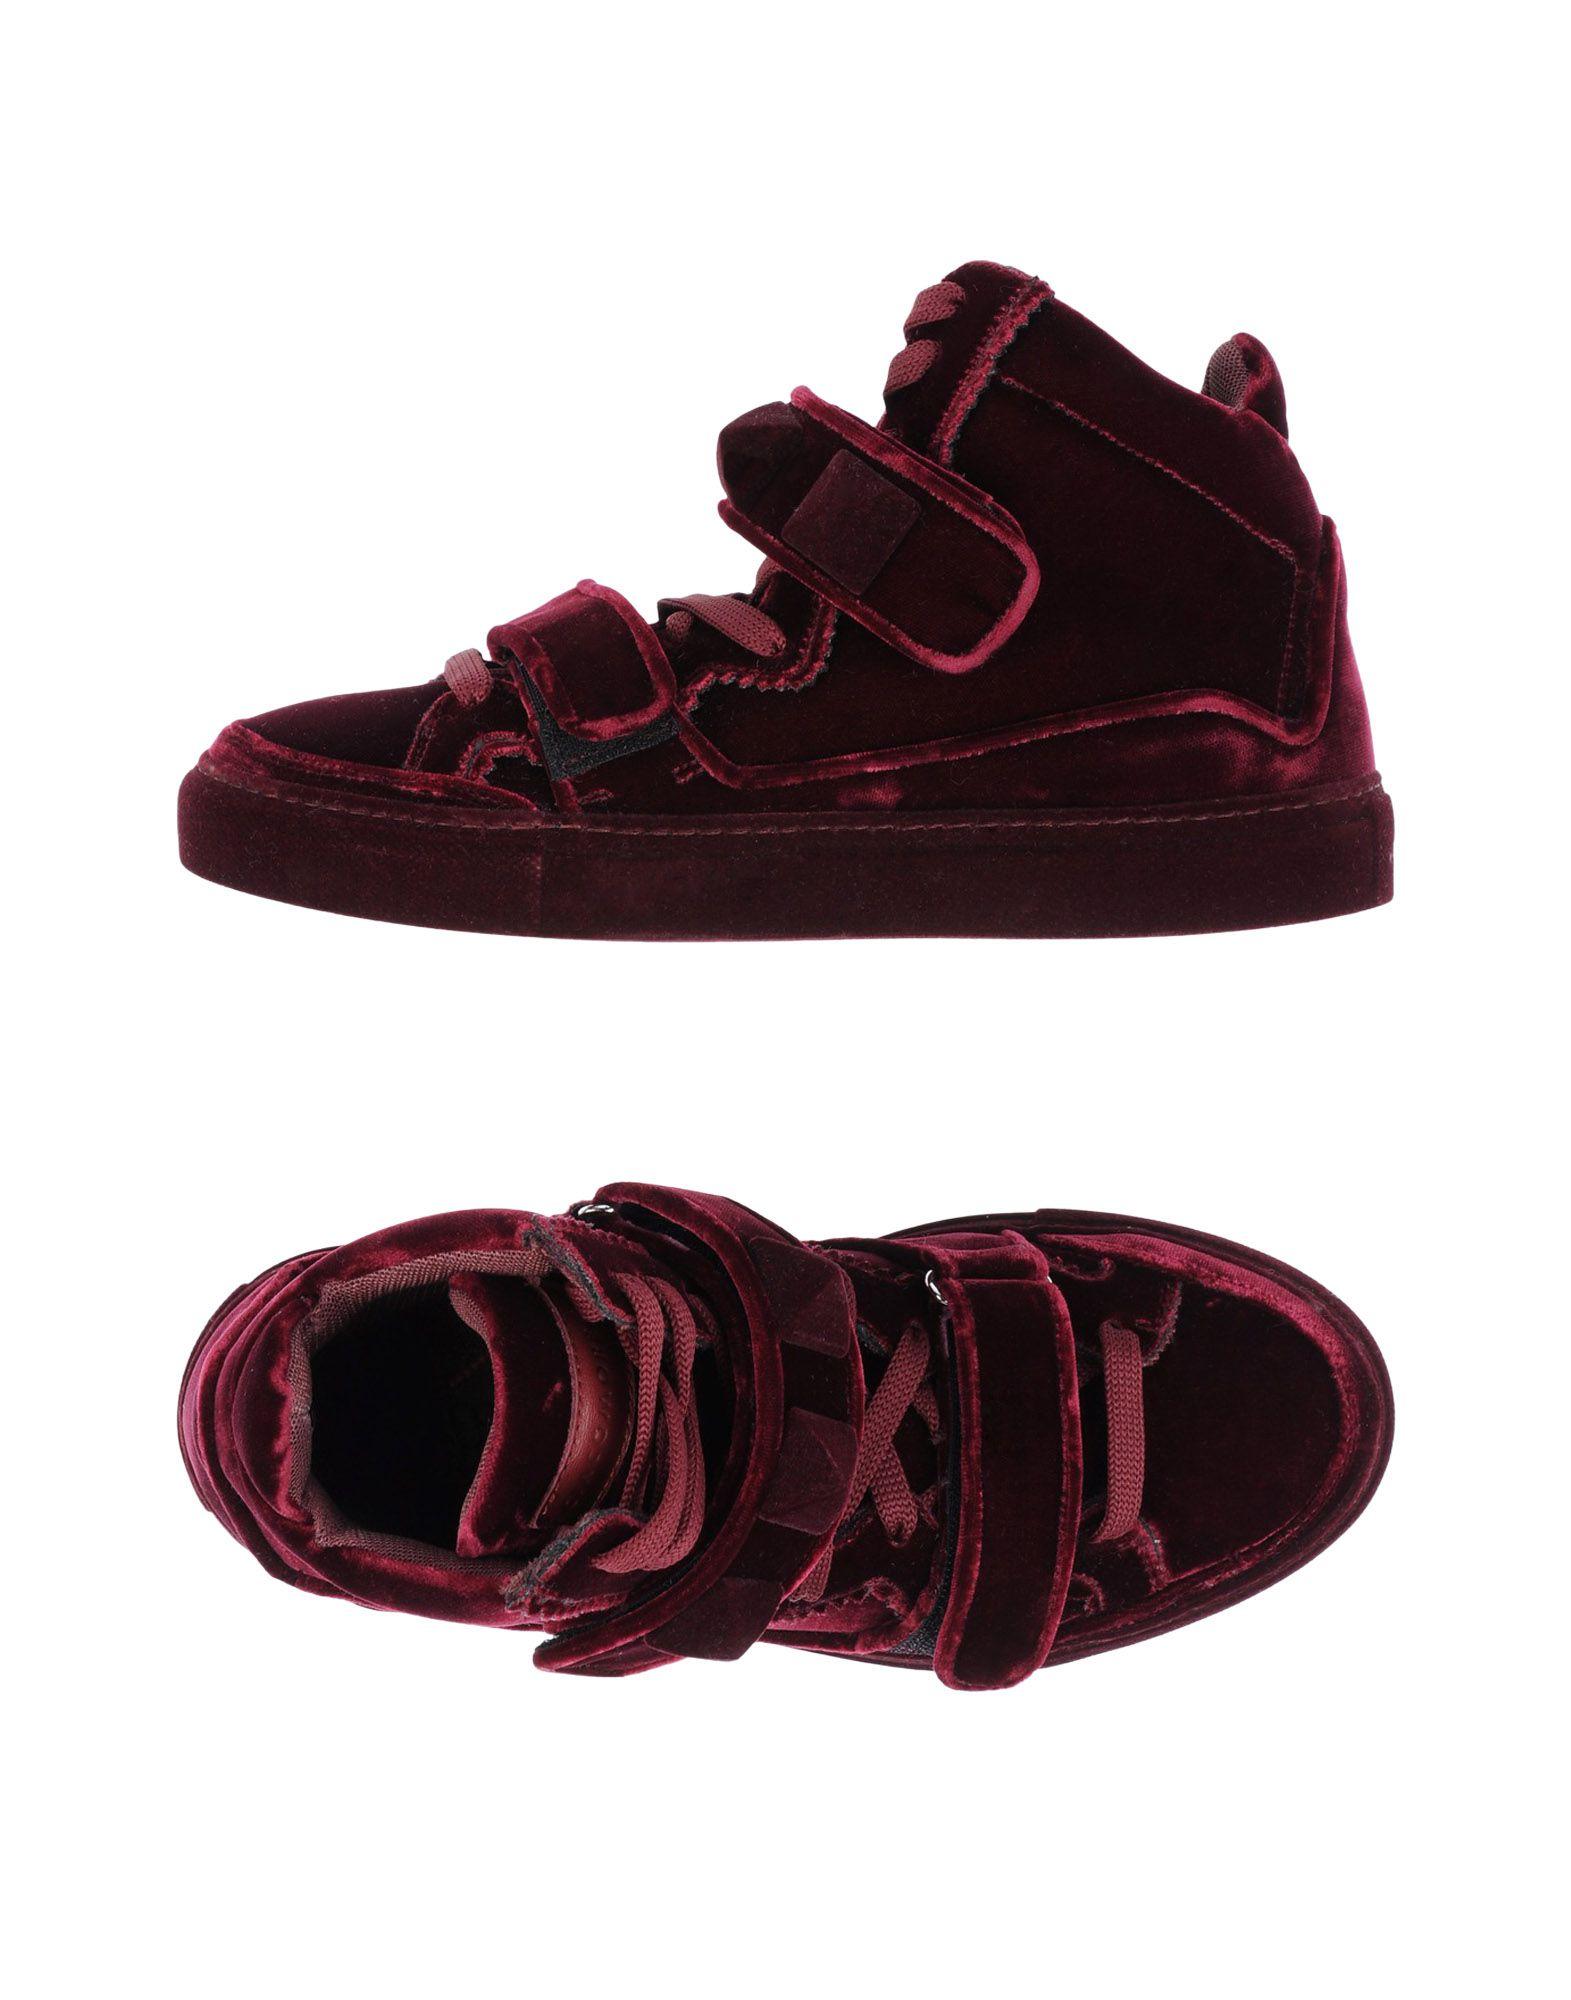 Haltbare Mode 11243413JD billige Schuhe Giacomorelli Sneakers Damen  11243413JD Mode Heiße Schuhe 18da6a